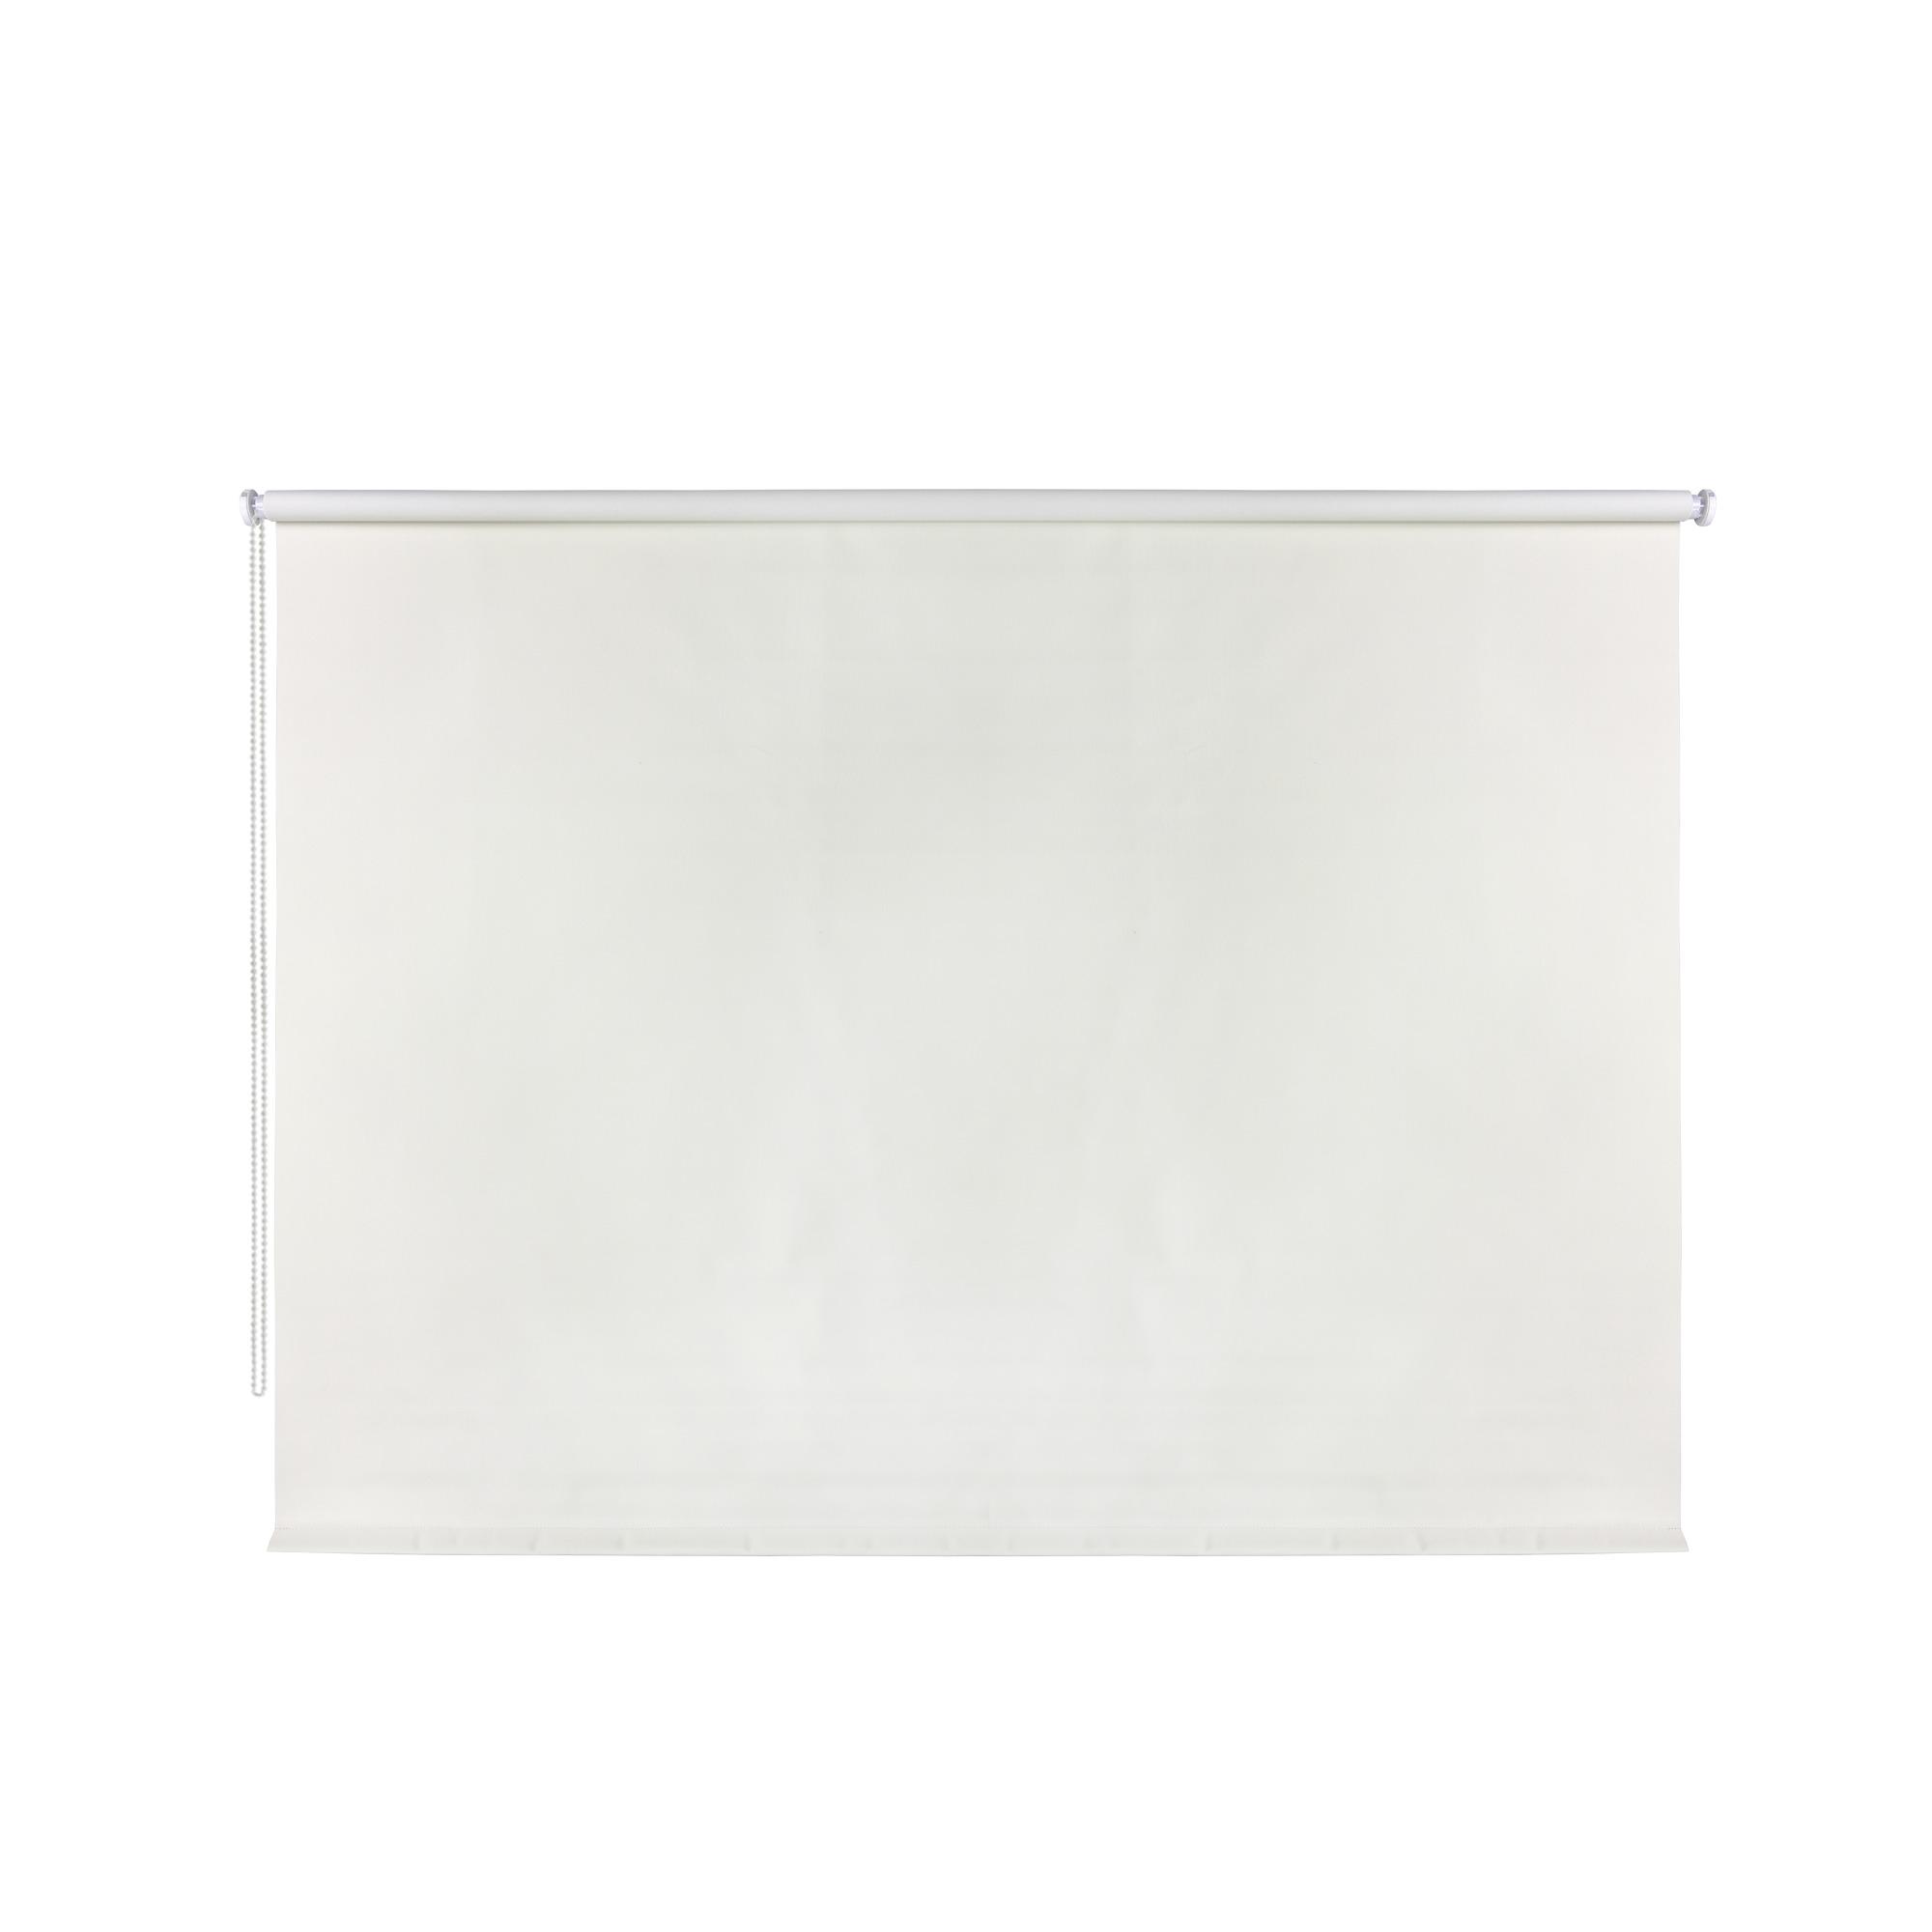 imagem de persiana rolo bege 160x170 - jolie persianasjpg